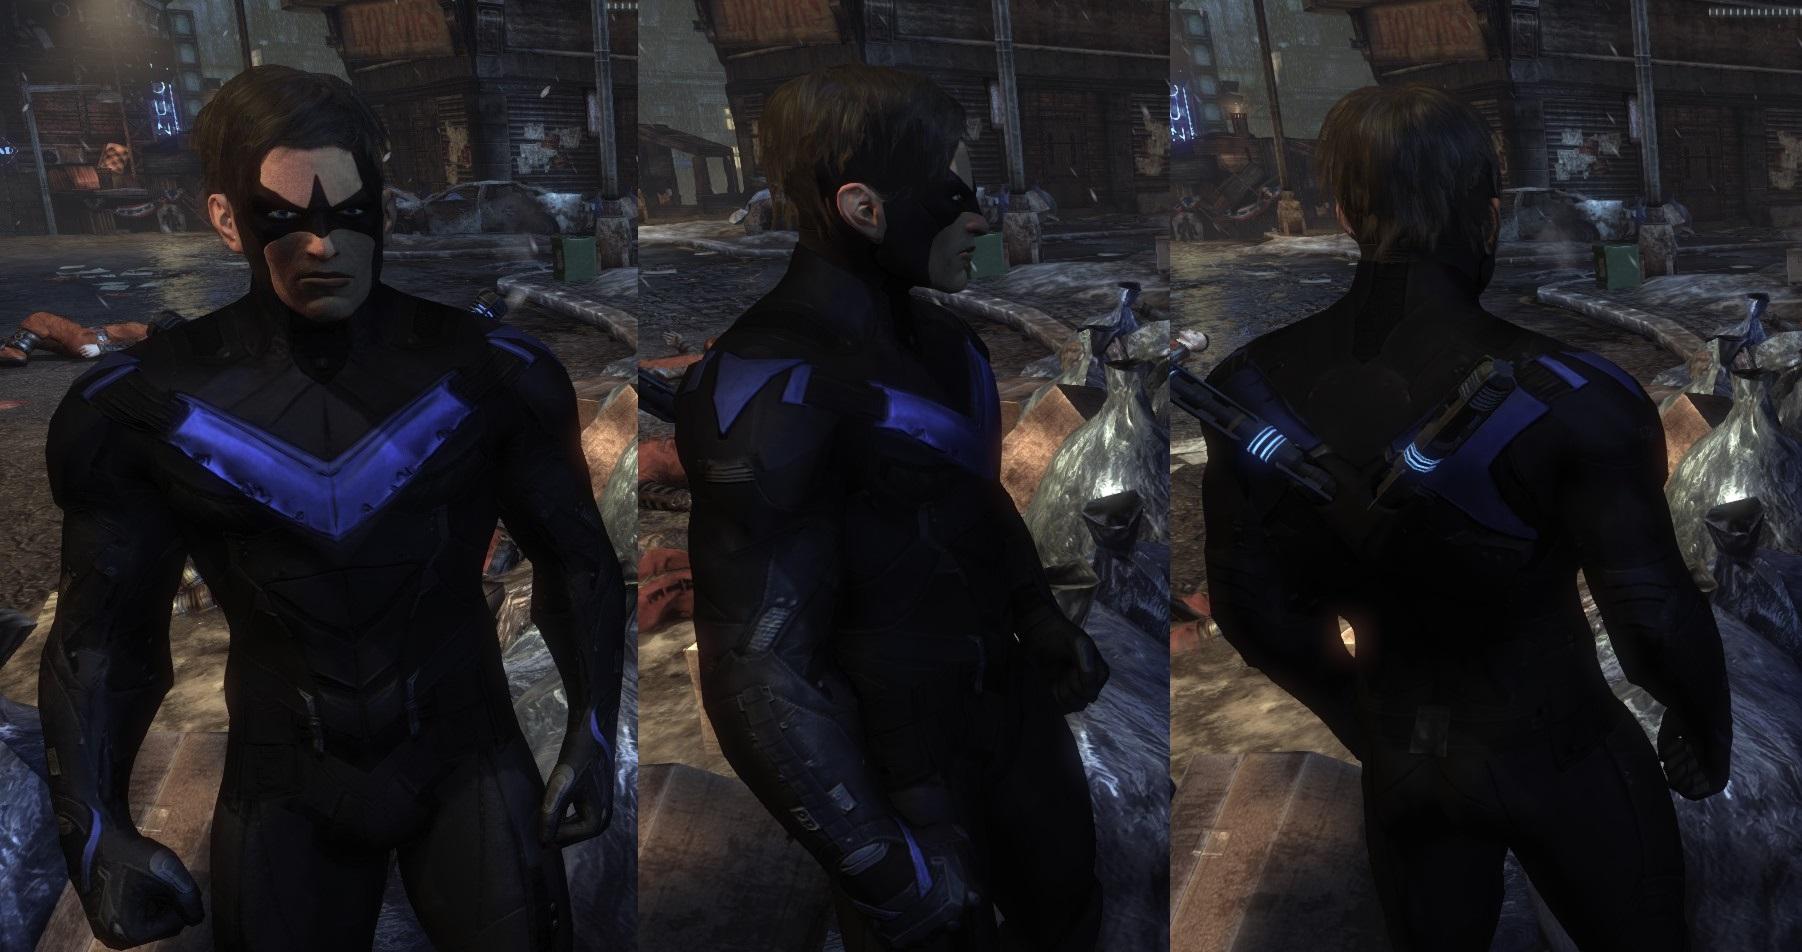 arkham knight nightwing final by mrjustarkhamgames on